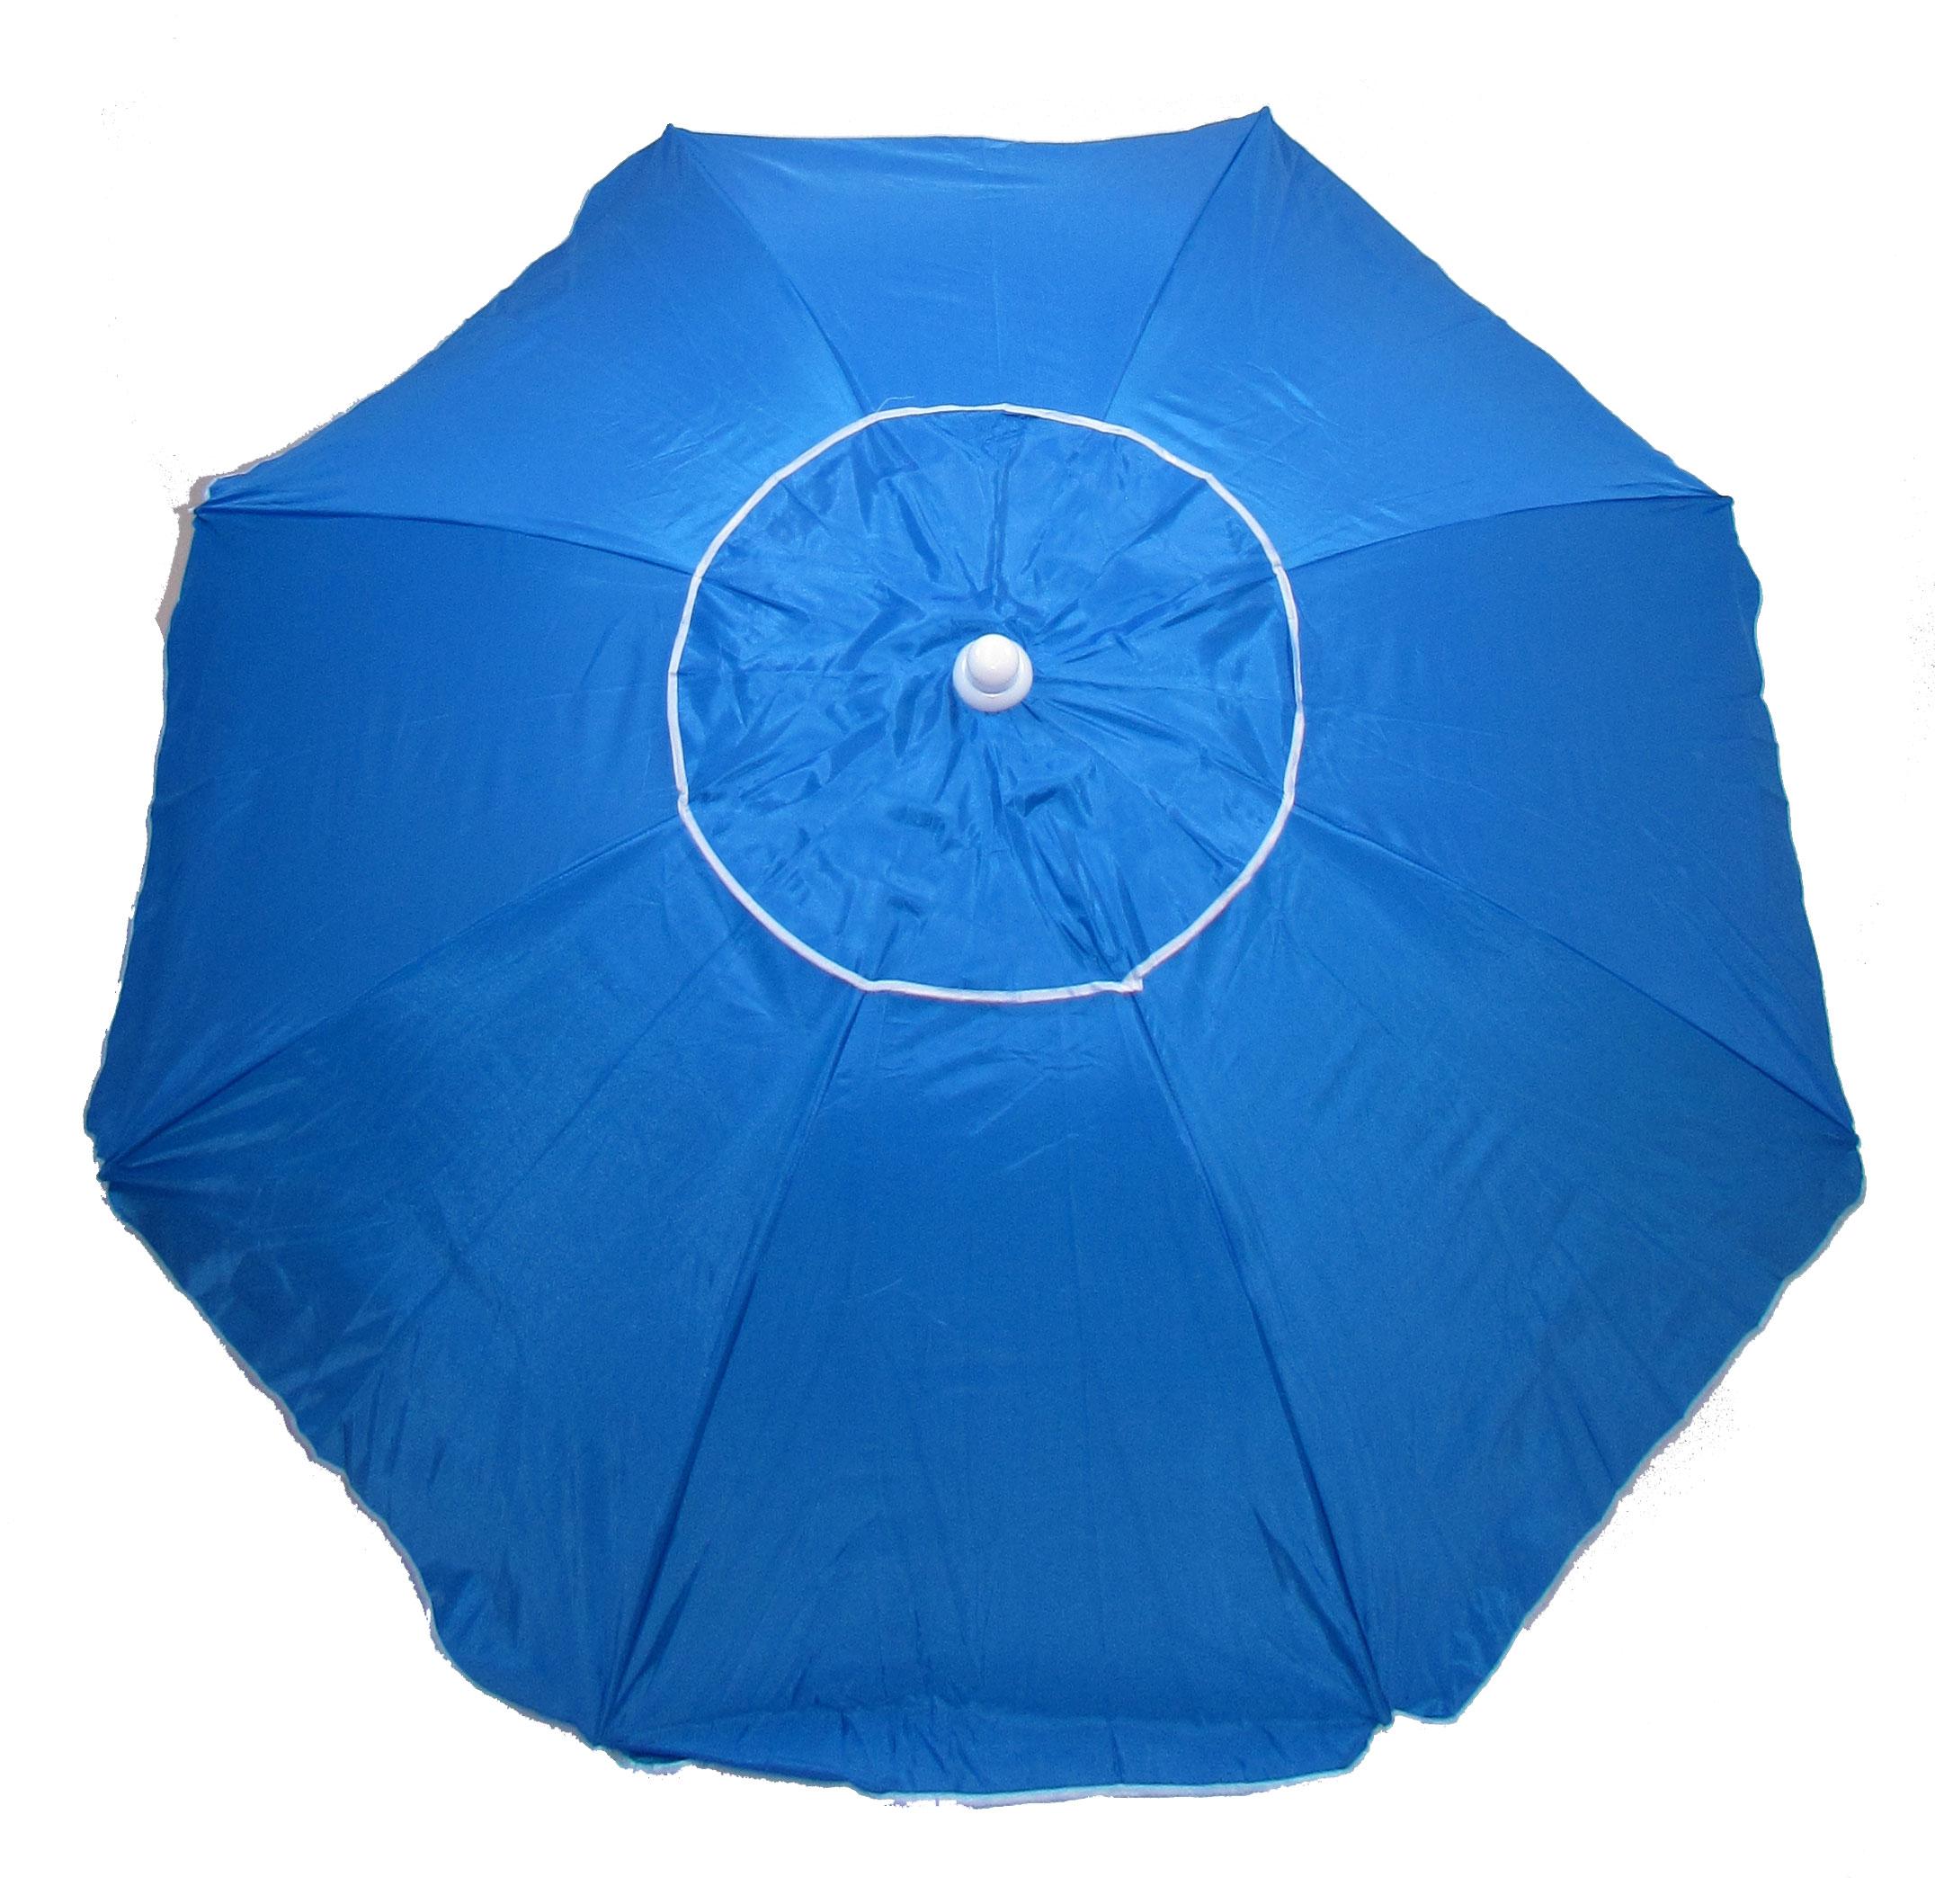 Oxford 6 ft. UV Coated Beach Tilt Umbrella with Vent